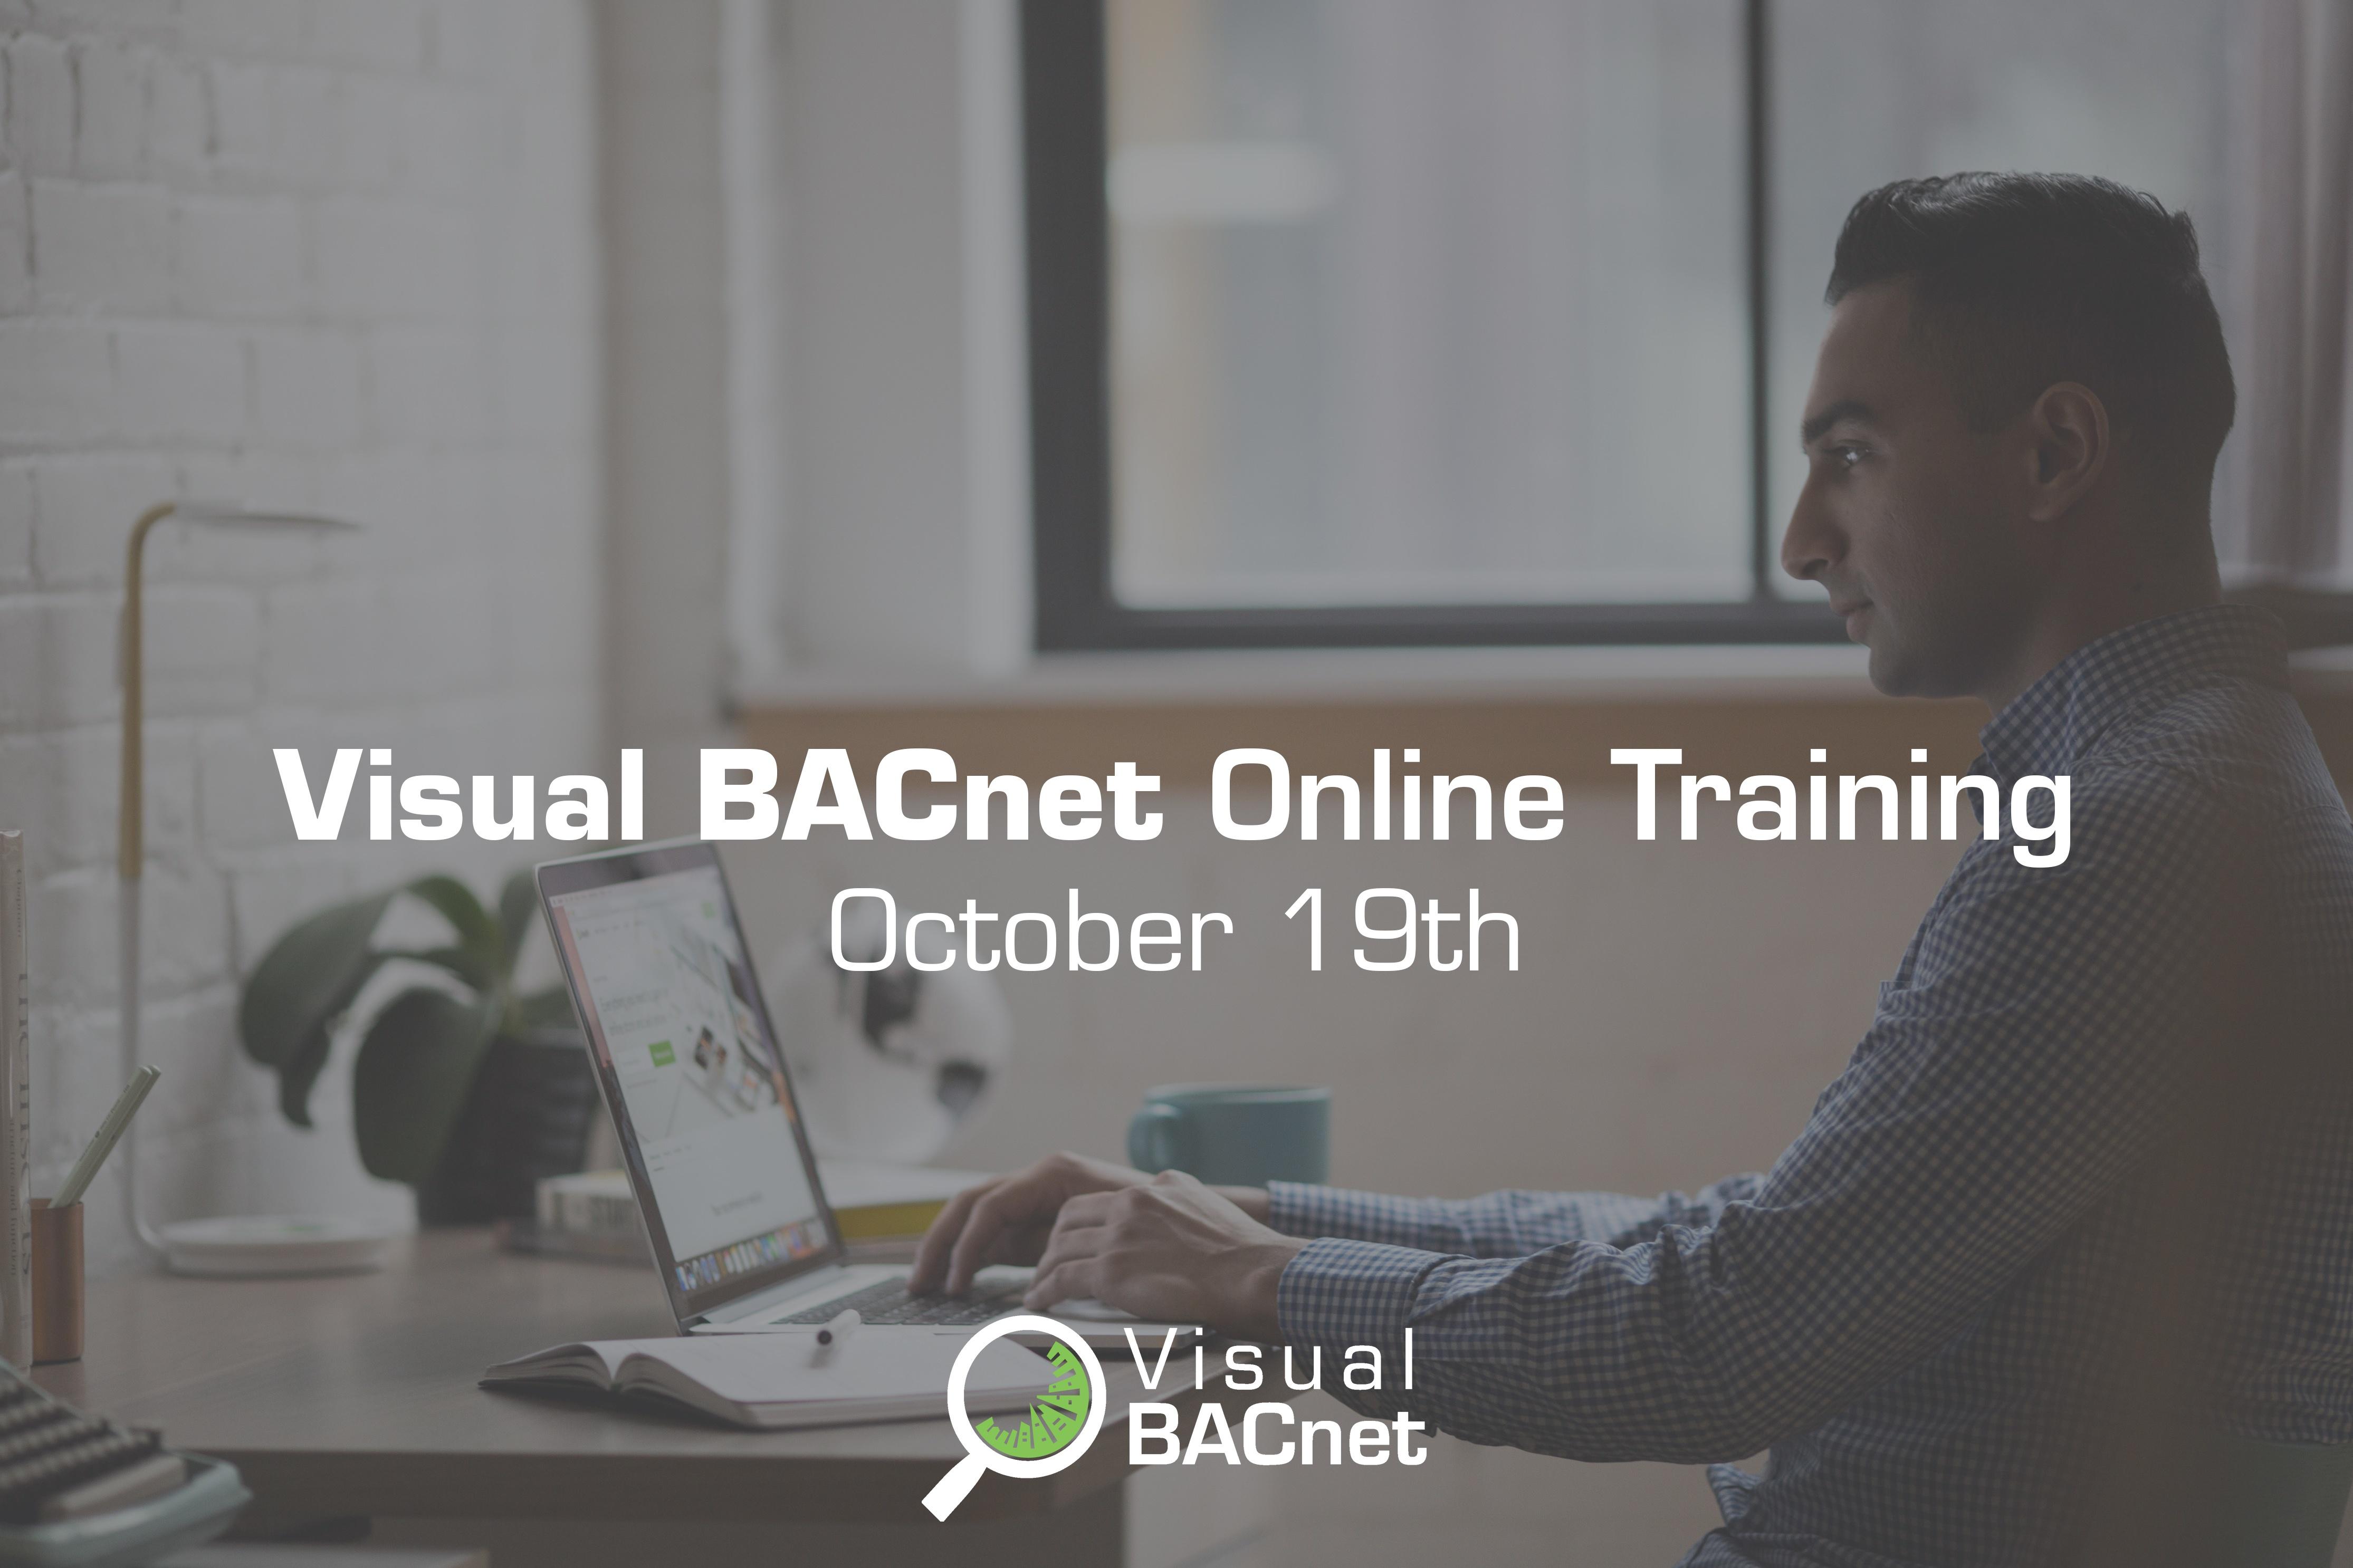 Visual BACnet online training